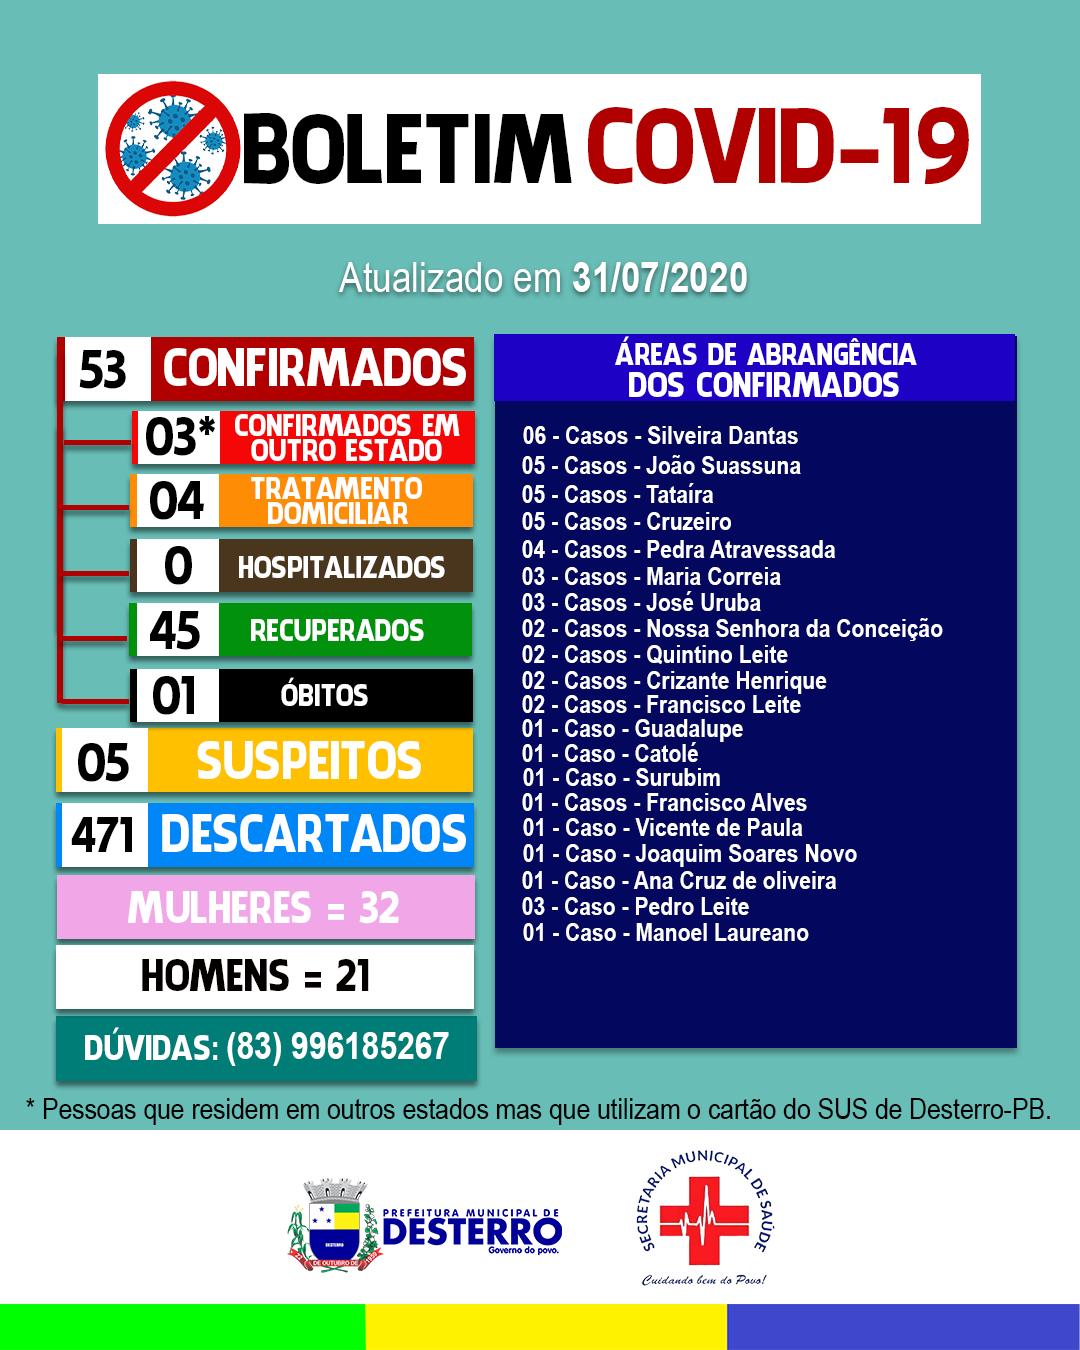 Boletim Covid-19 (31/07/2020)